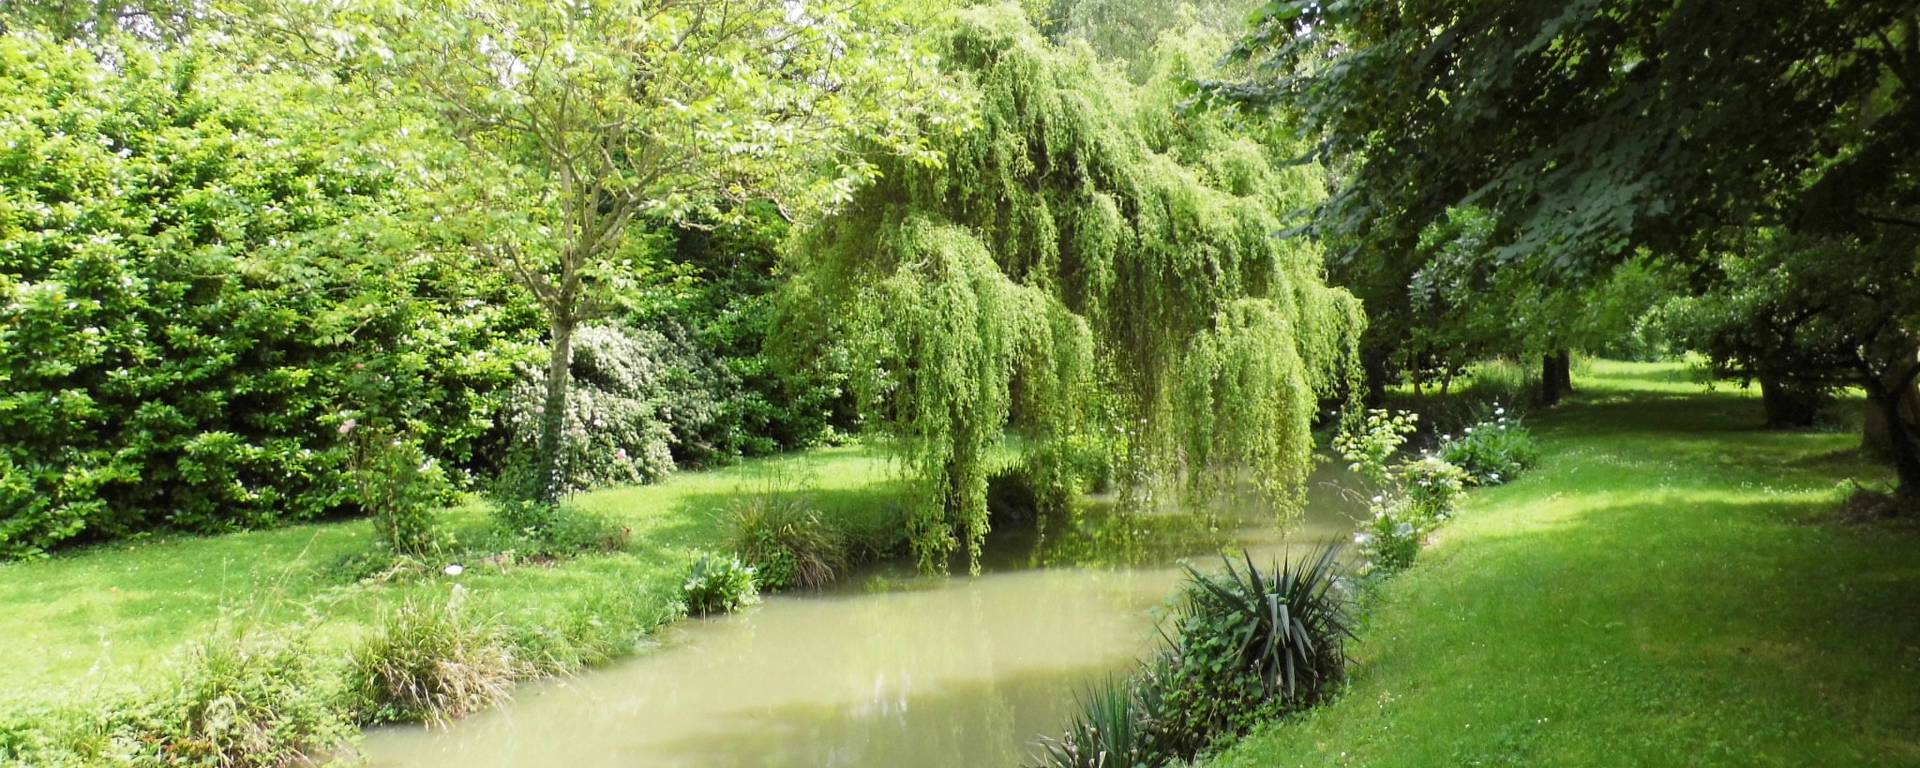 Étang, Jardin, Parc de Pétraque, Lombez, Savès